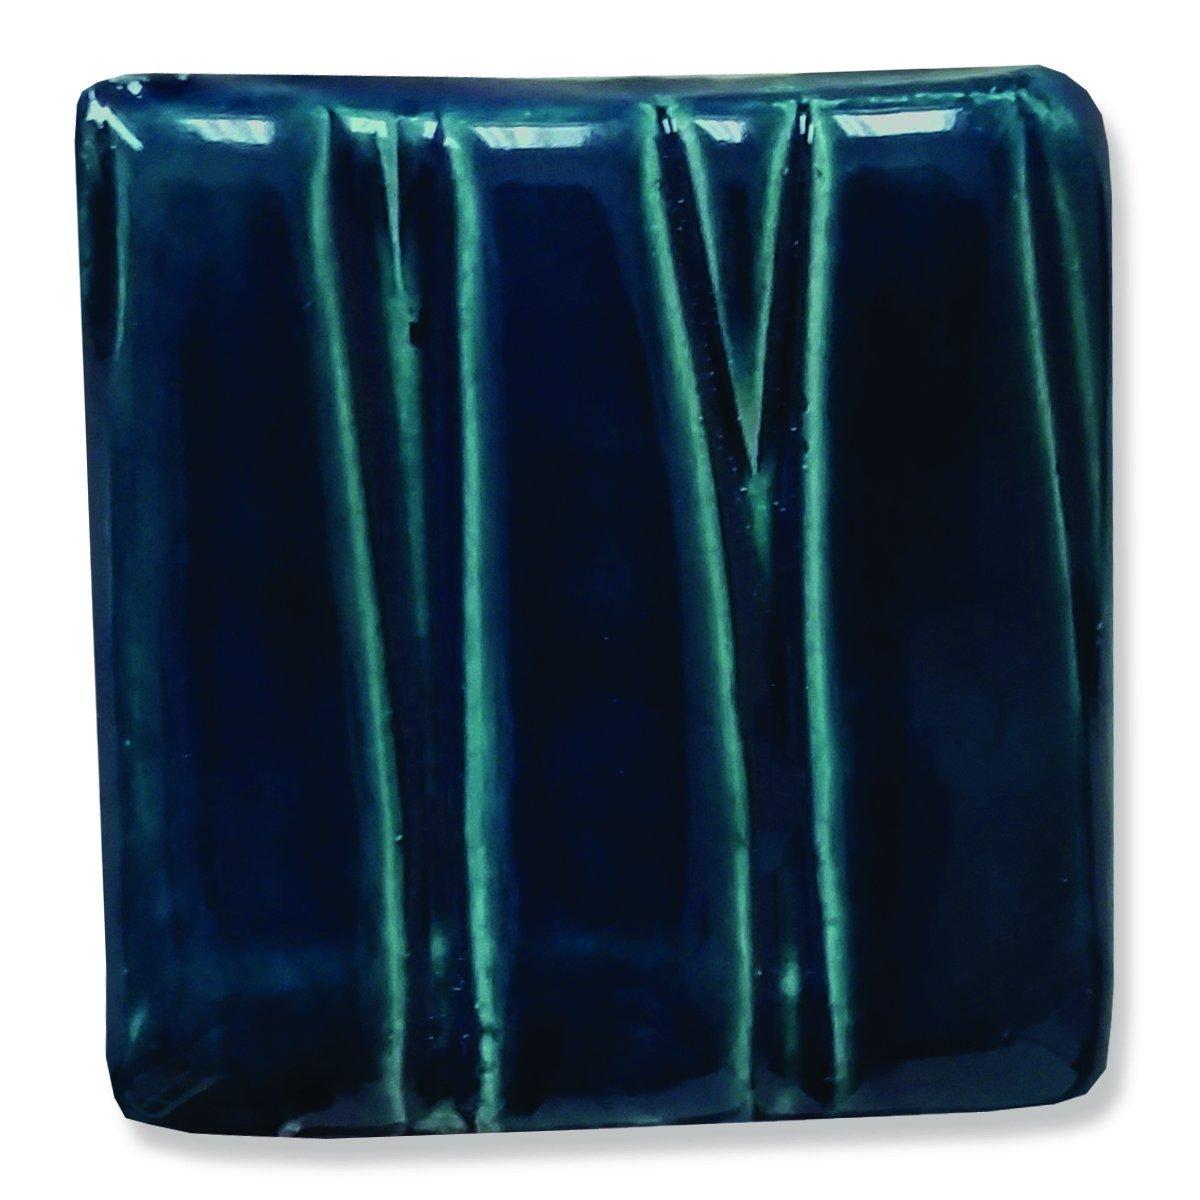 Speedball Art 16 oz. (pint) Earthenware Glaze--Sea Blue